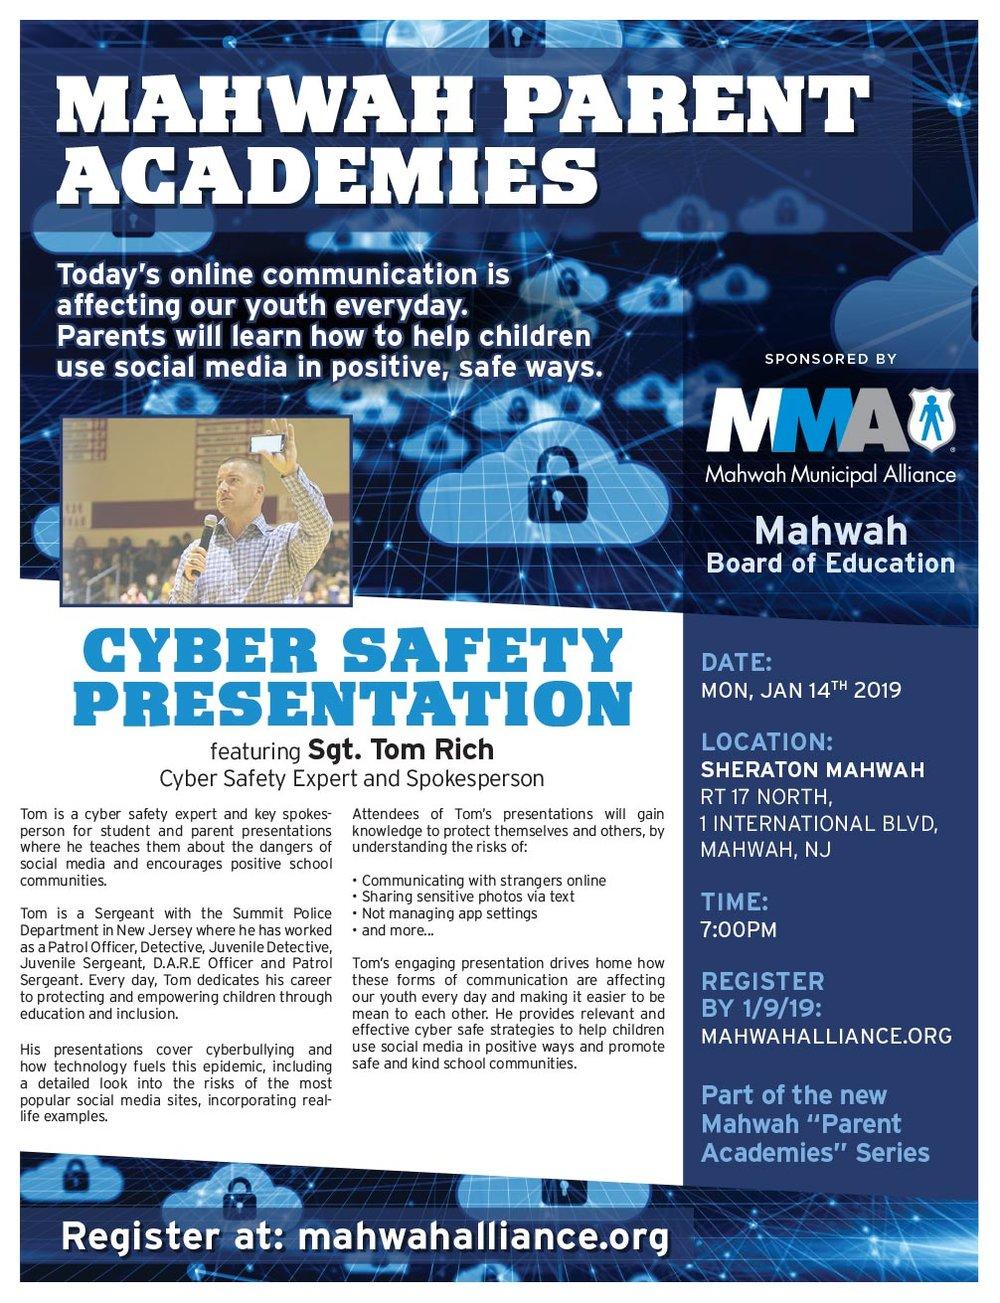 MMA-Parent-Academy-Cyber-Safety-1-19.jpg